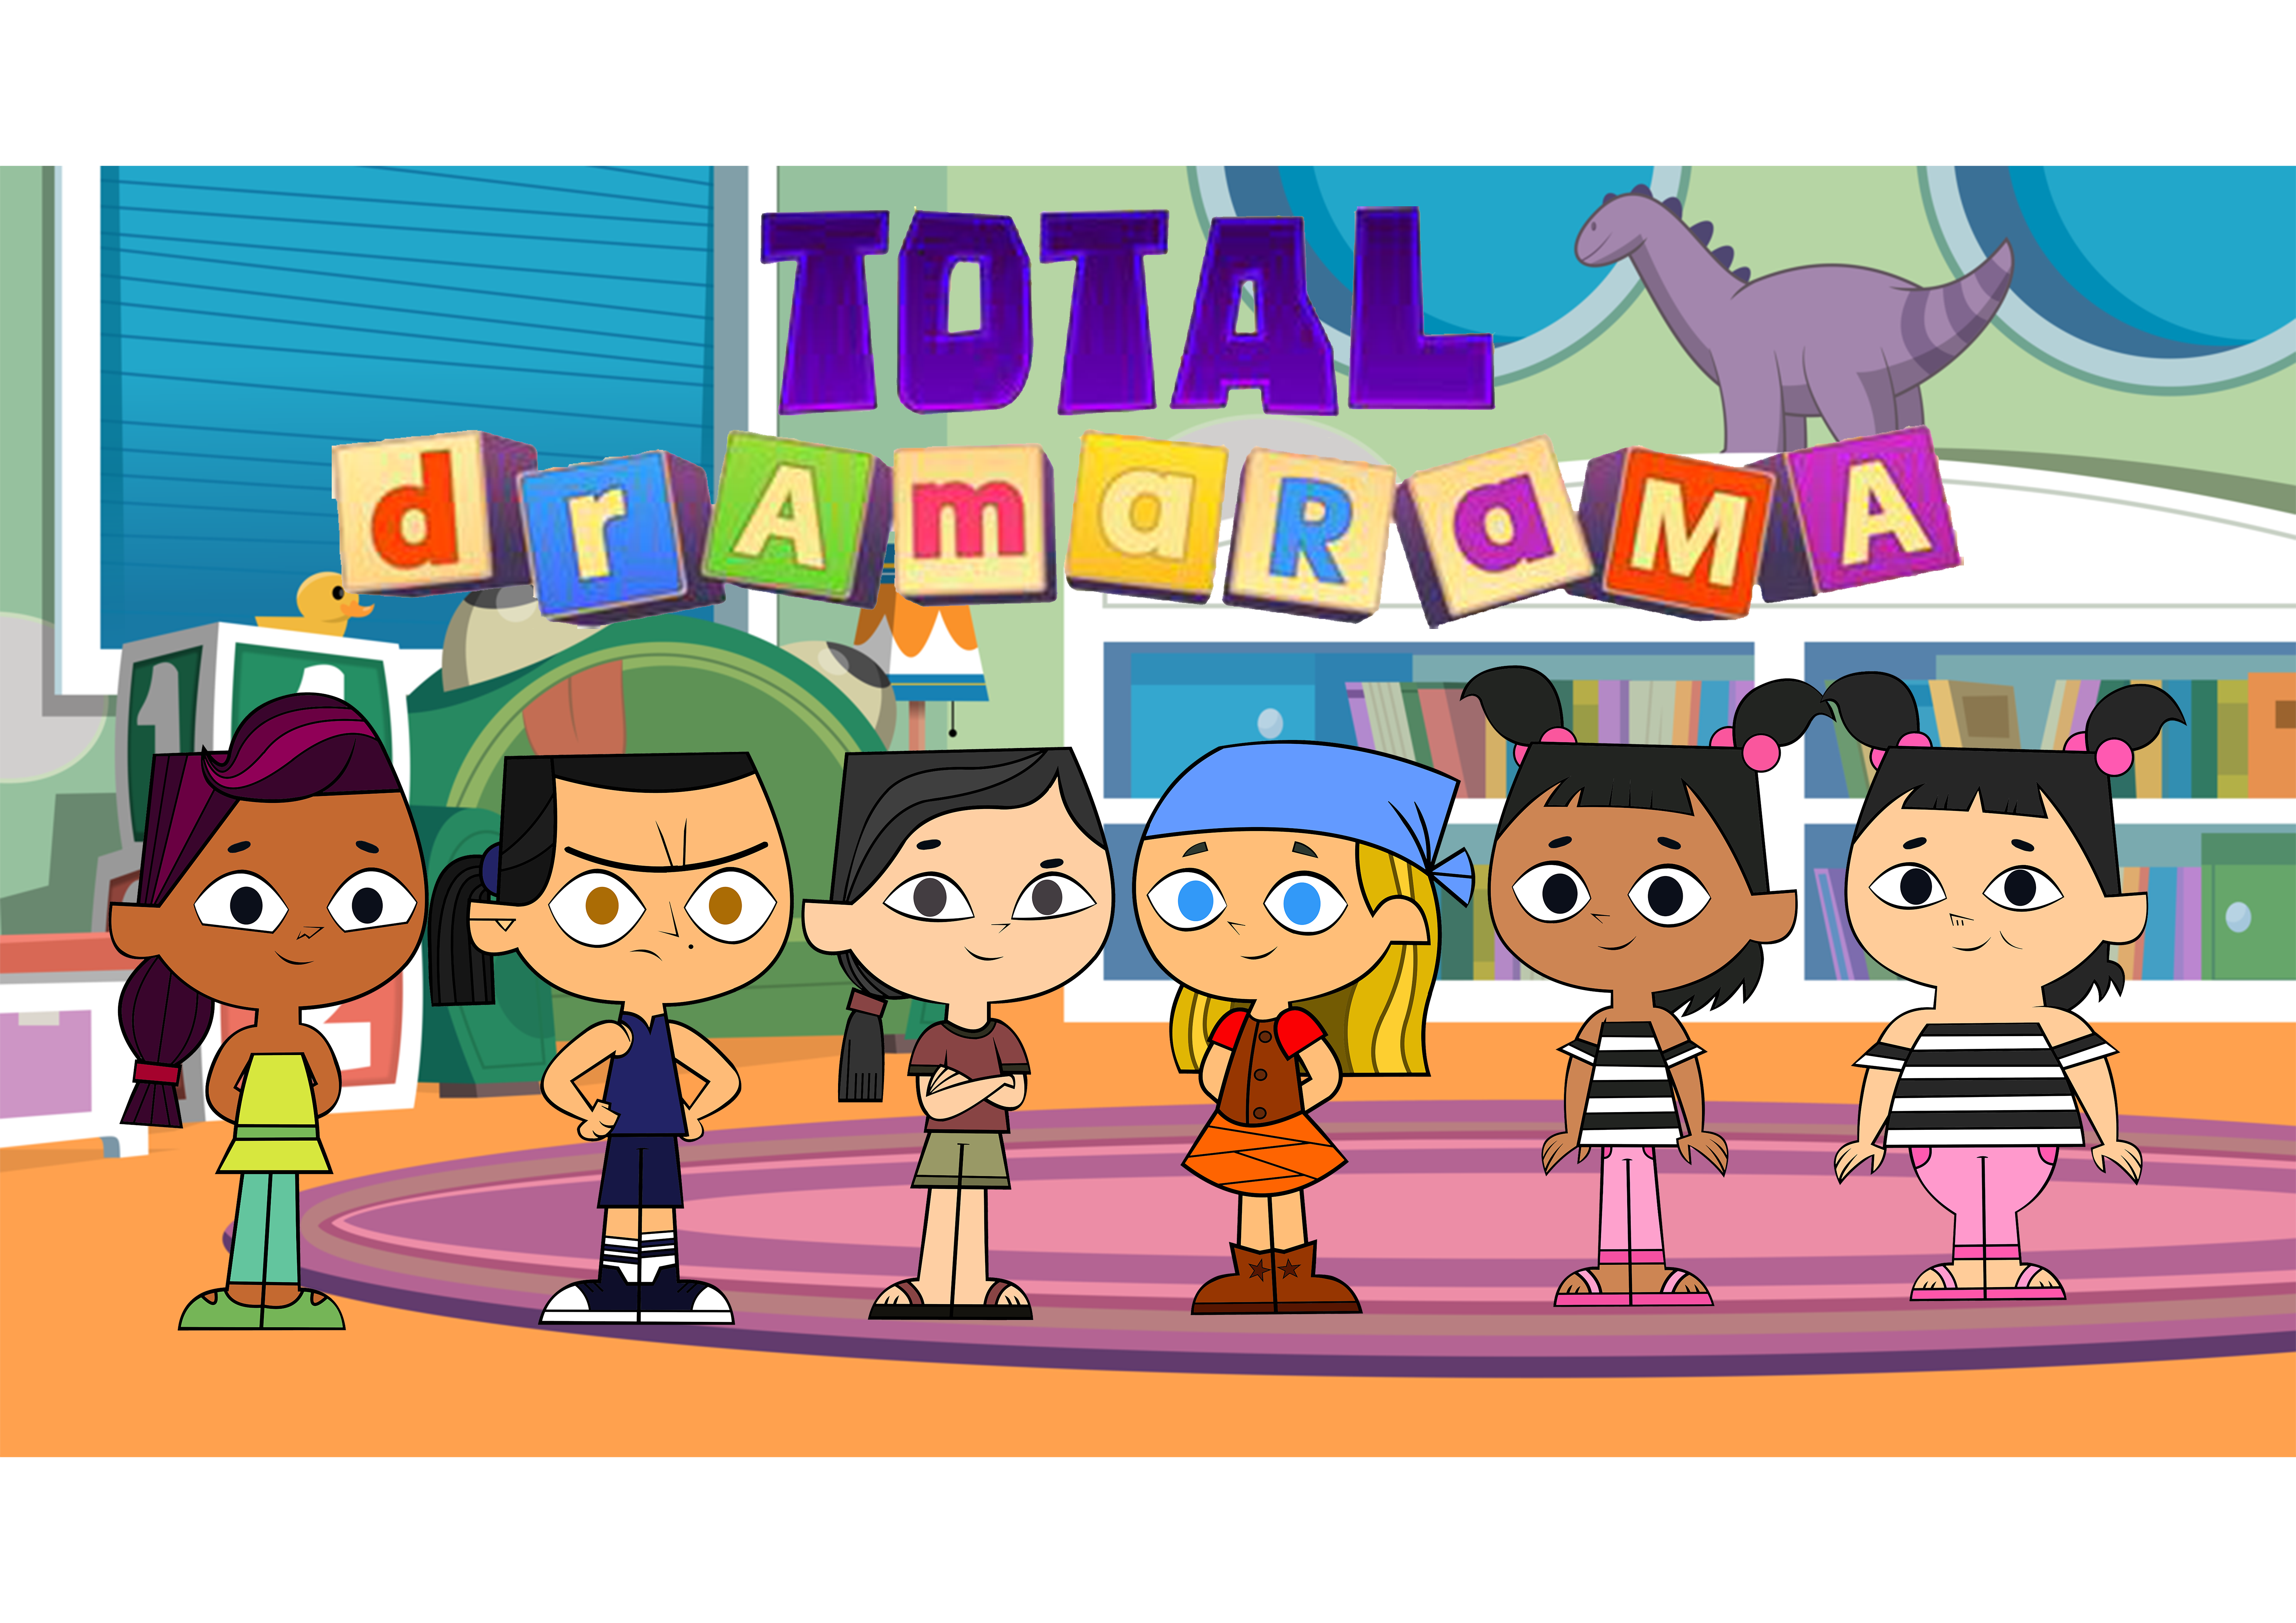 Total Dramarama - Cast by JaDraws on DeviantArt